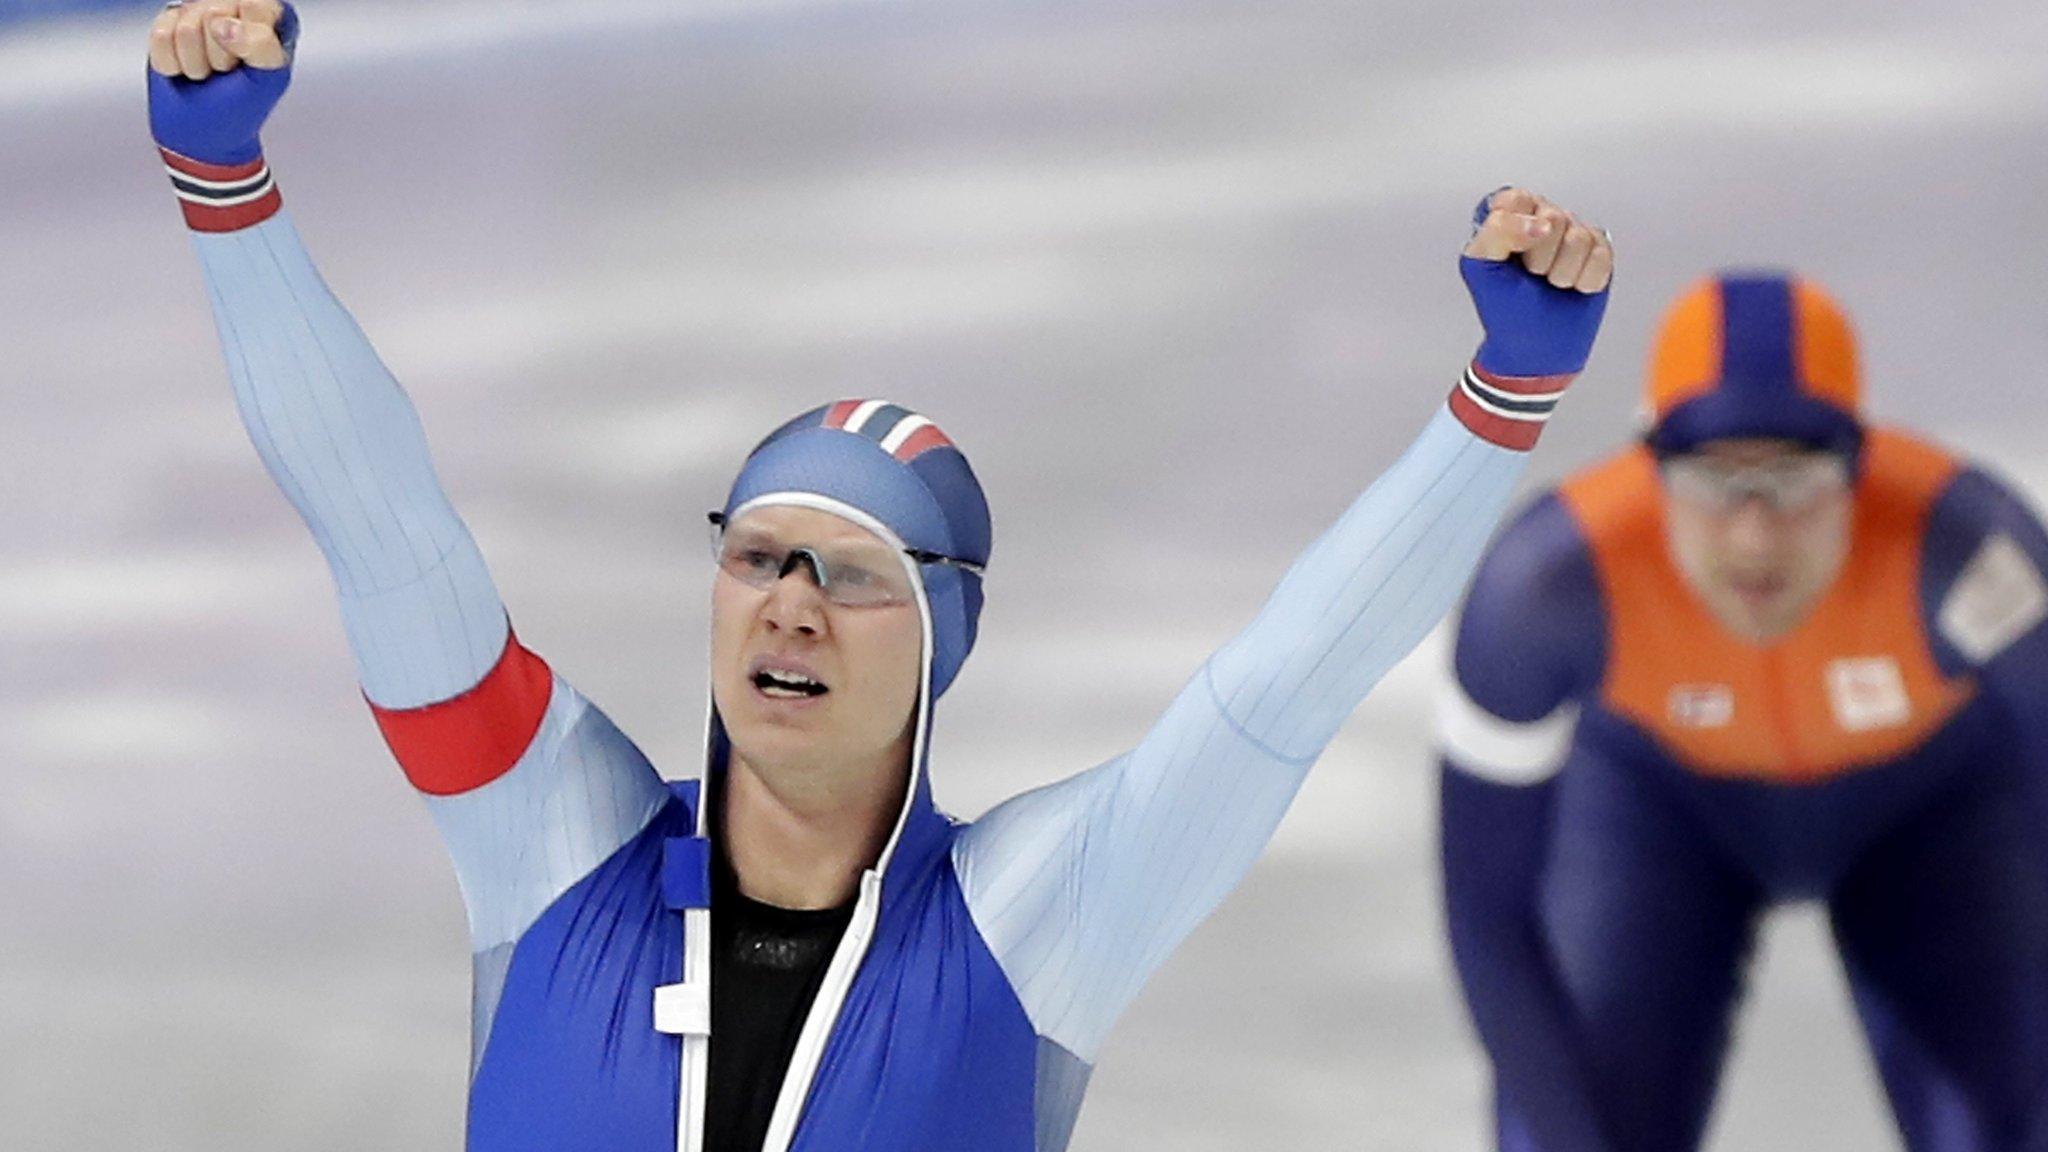 (BBC News):#Winter #Olympics: Norway's Lorentzen wins mens speed skating gold : Watch as.. https://t.co/PN4kYLMceR https://t.co/XYavCxOkm4